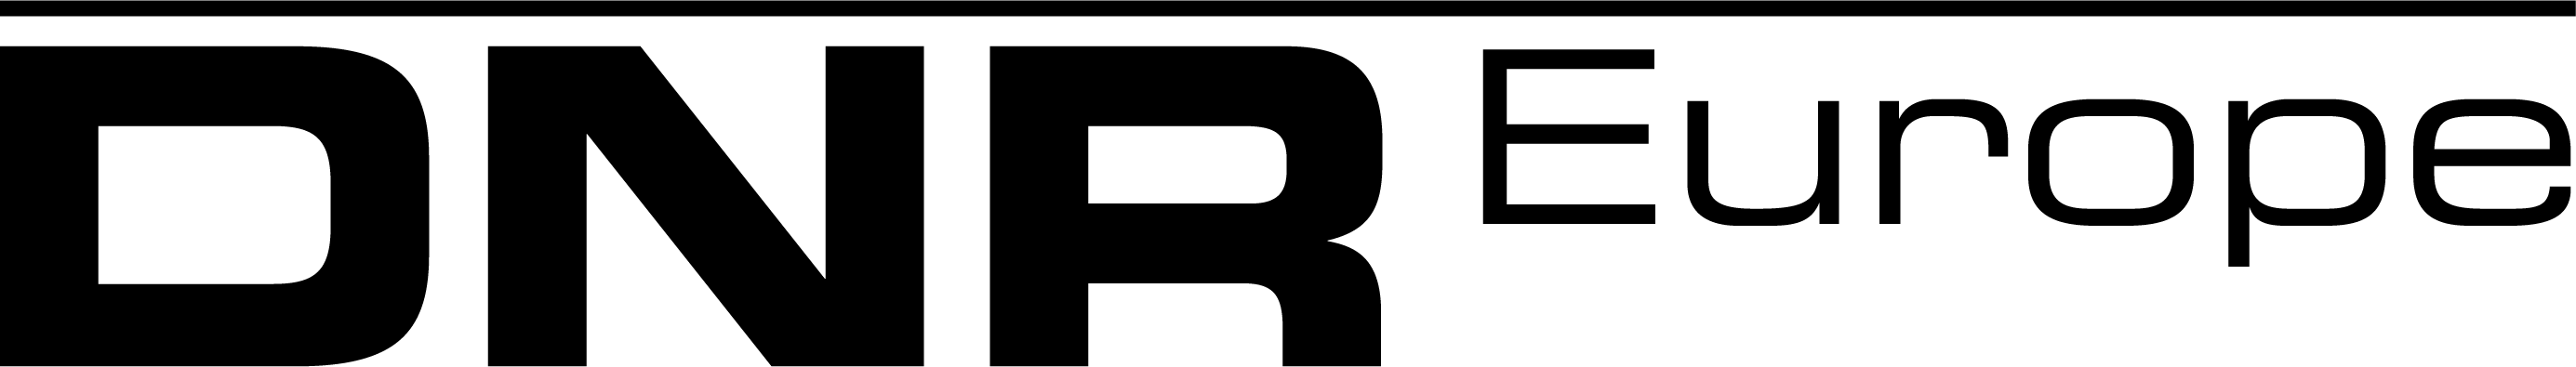 DNReurope Noir